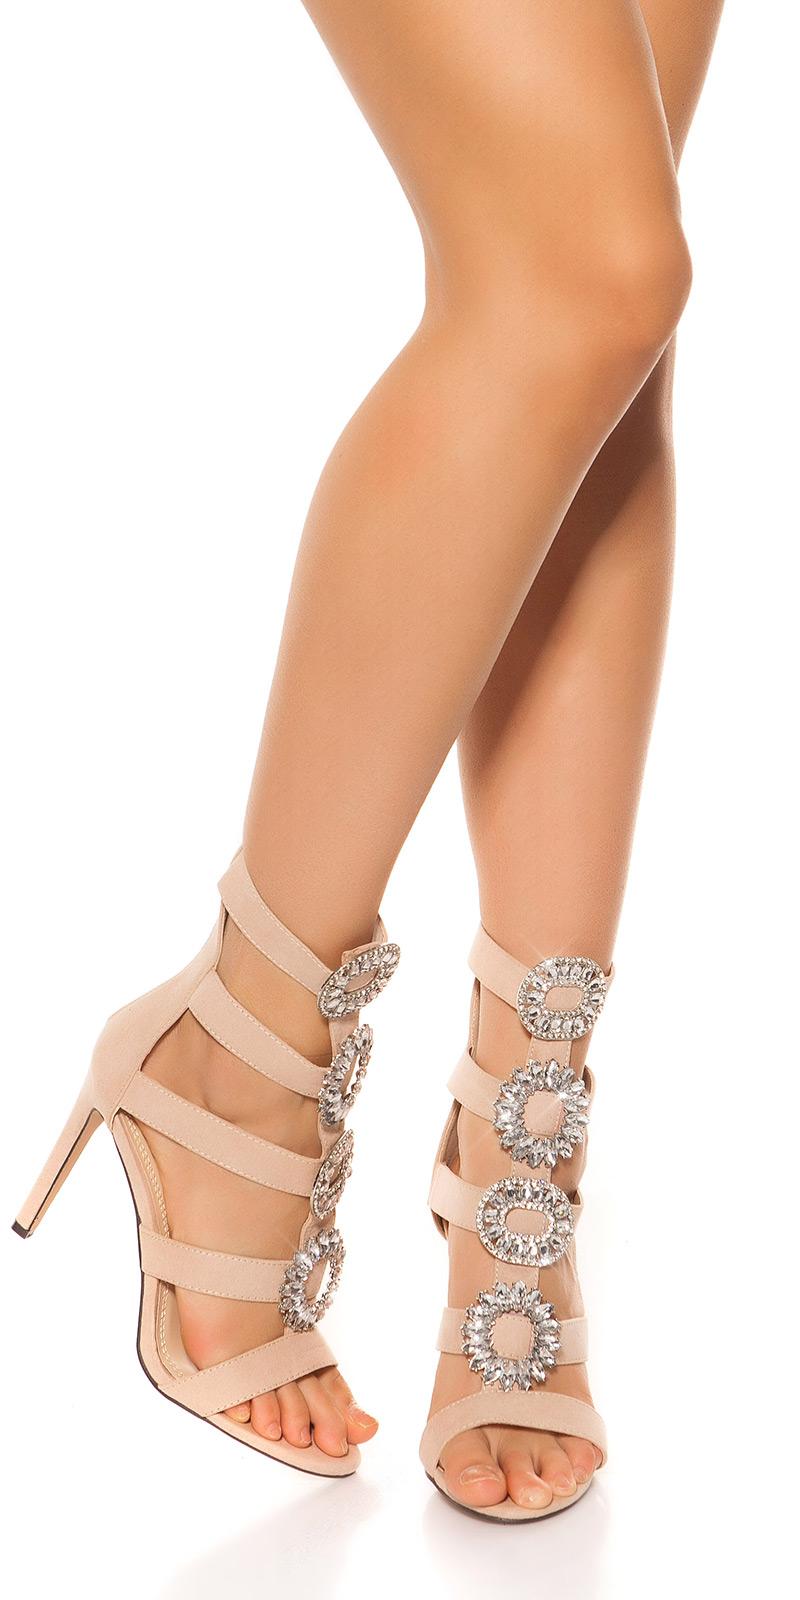 Sandale Sexy Highheel cu XL strasuri